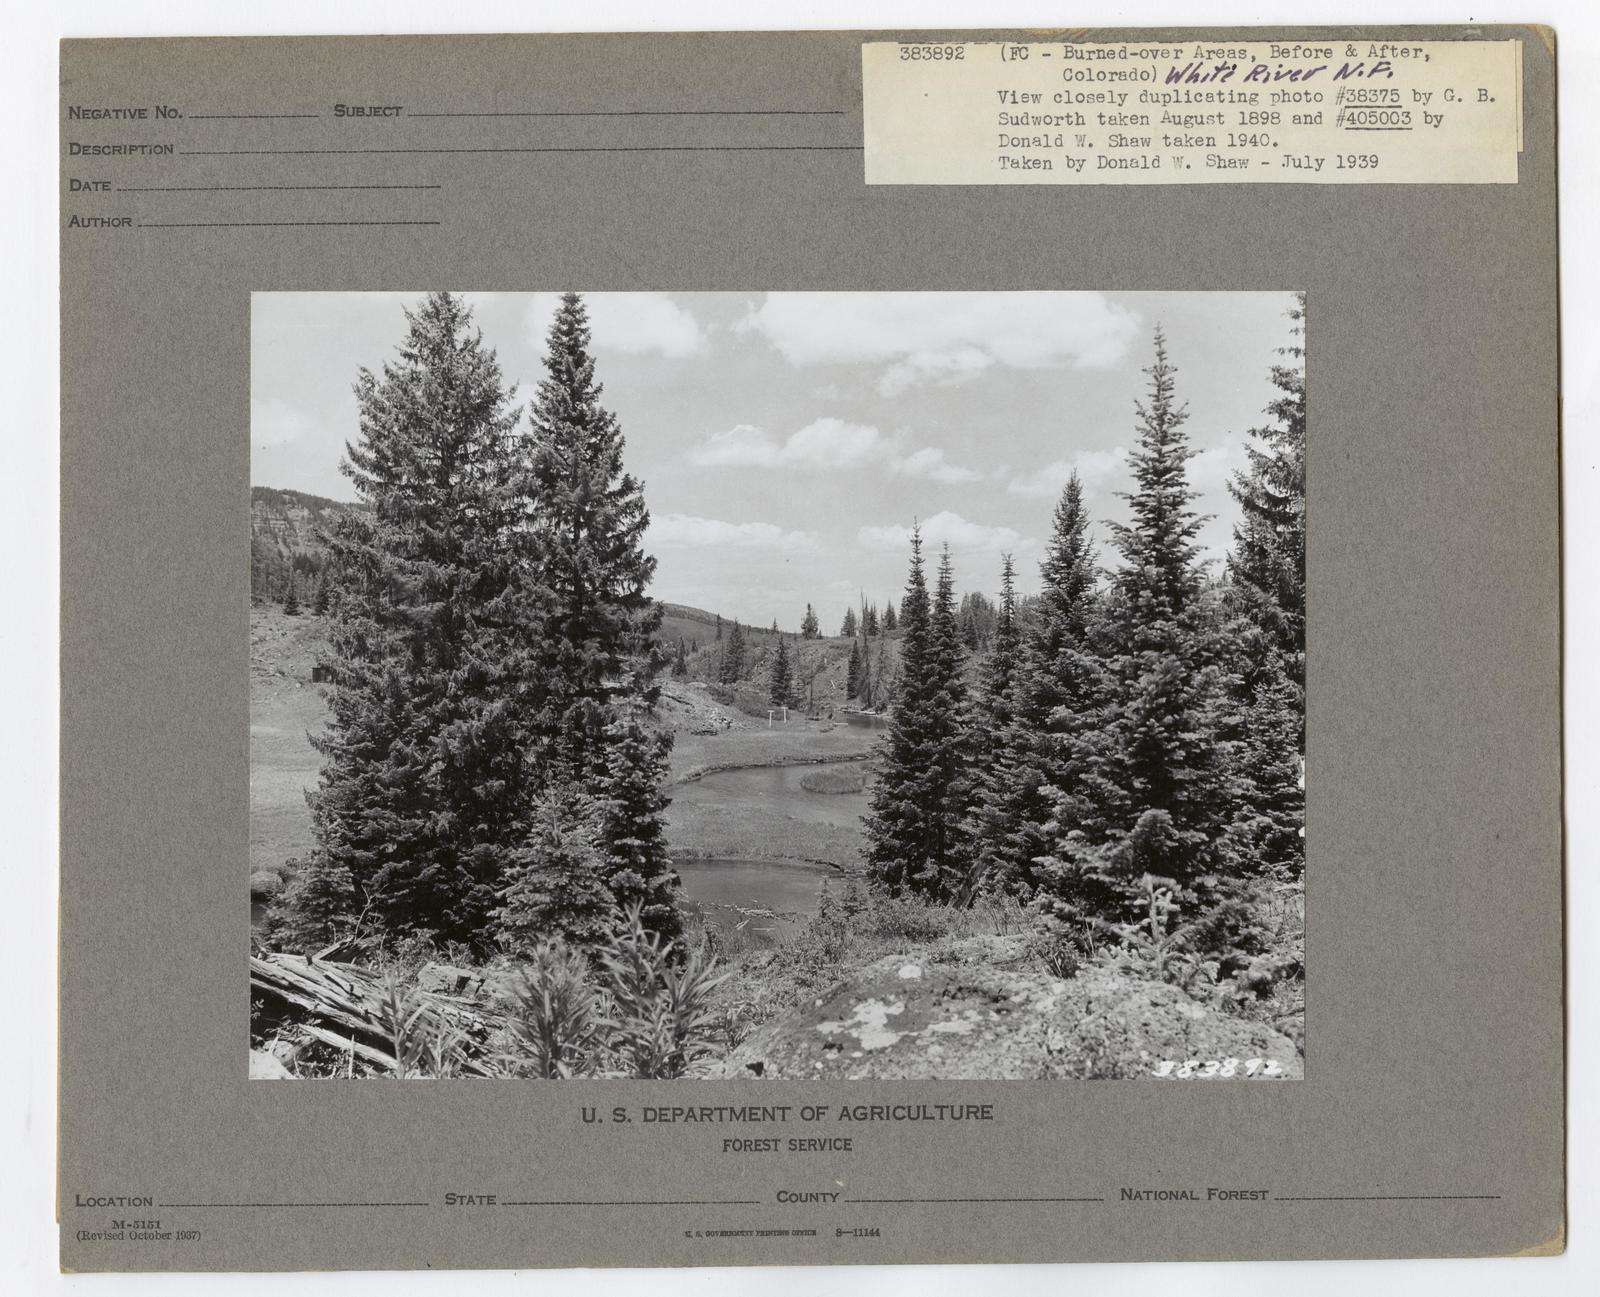 Burned -Over Areas - Camera Point - Colorado